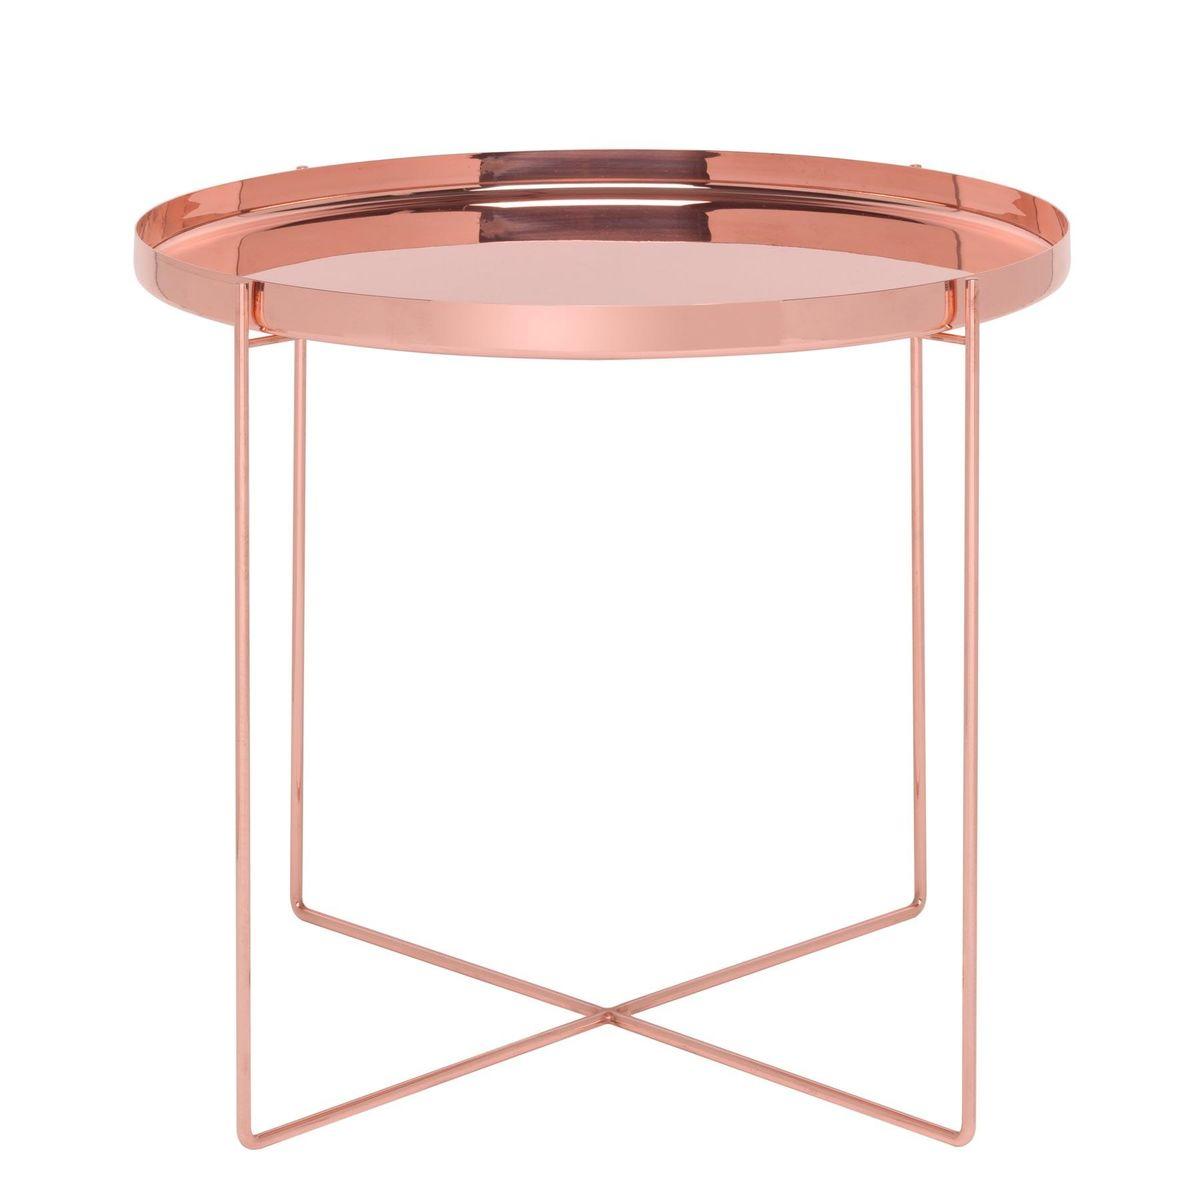 E15   E15 Habibi Side Table / Tray CM05   Copper/polished/Ø 57cm